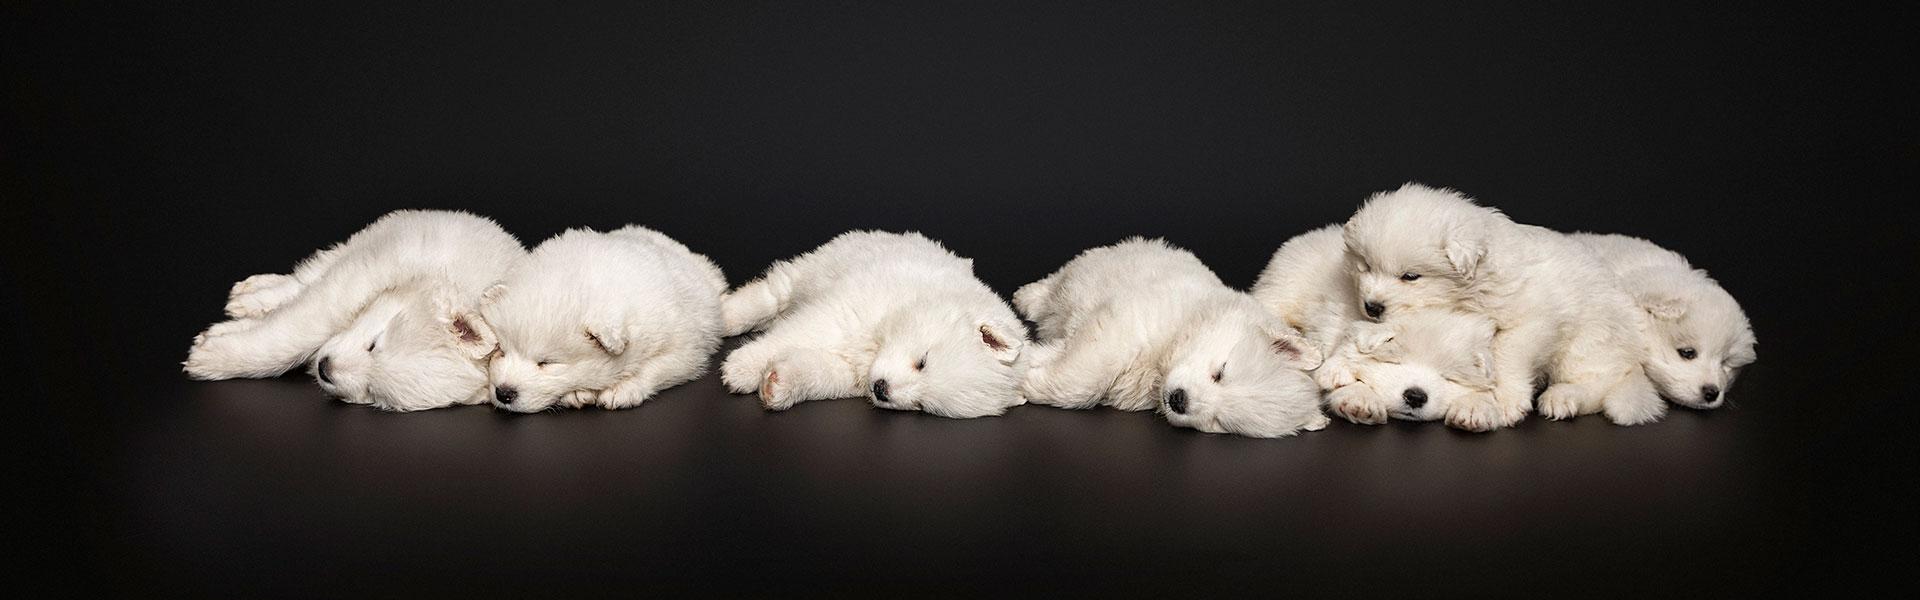 Samoyed Puppies Photography